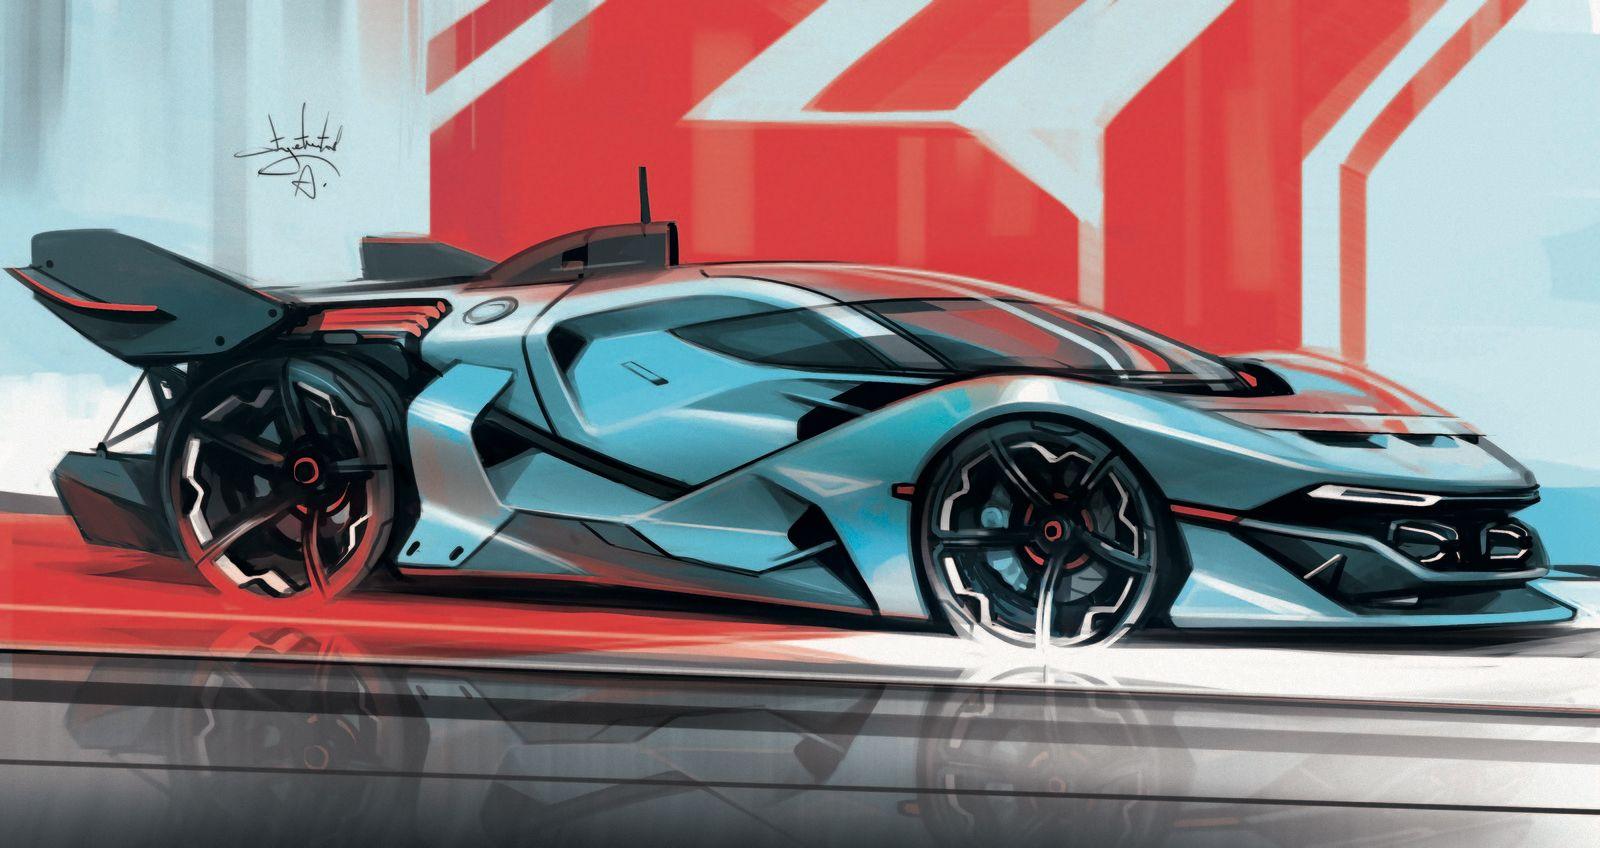 Concept Car Design Sketch Futuristic Supercar Industrial Design Digital Sketches Concept Car Renders Vehi Concept Cars Concept Car Design Car Design Sketch